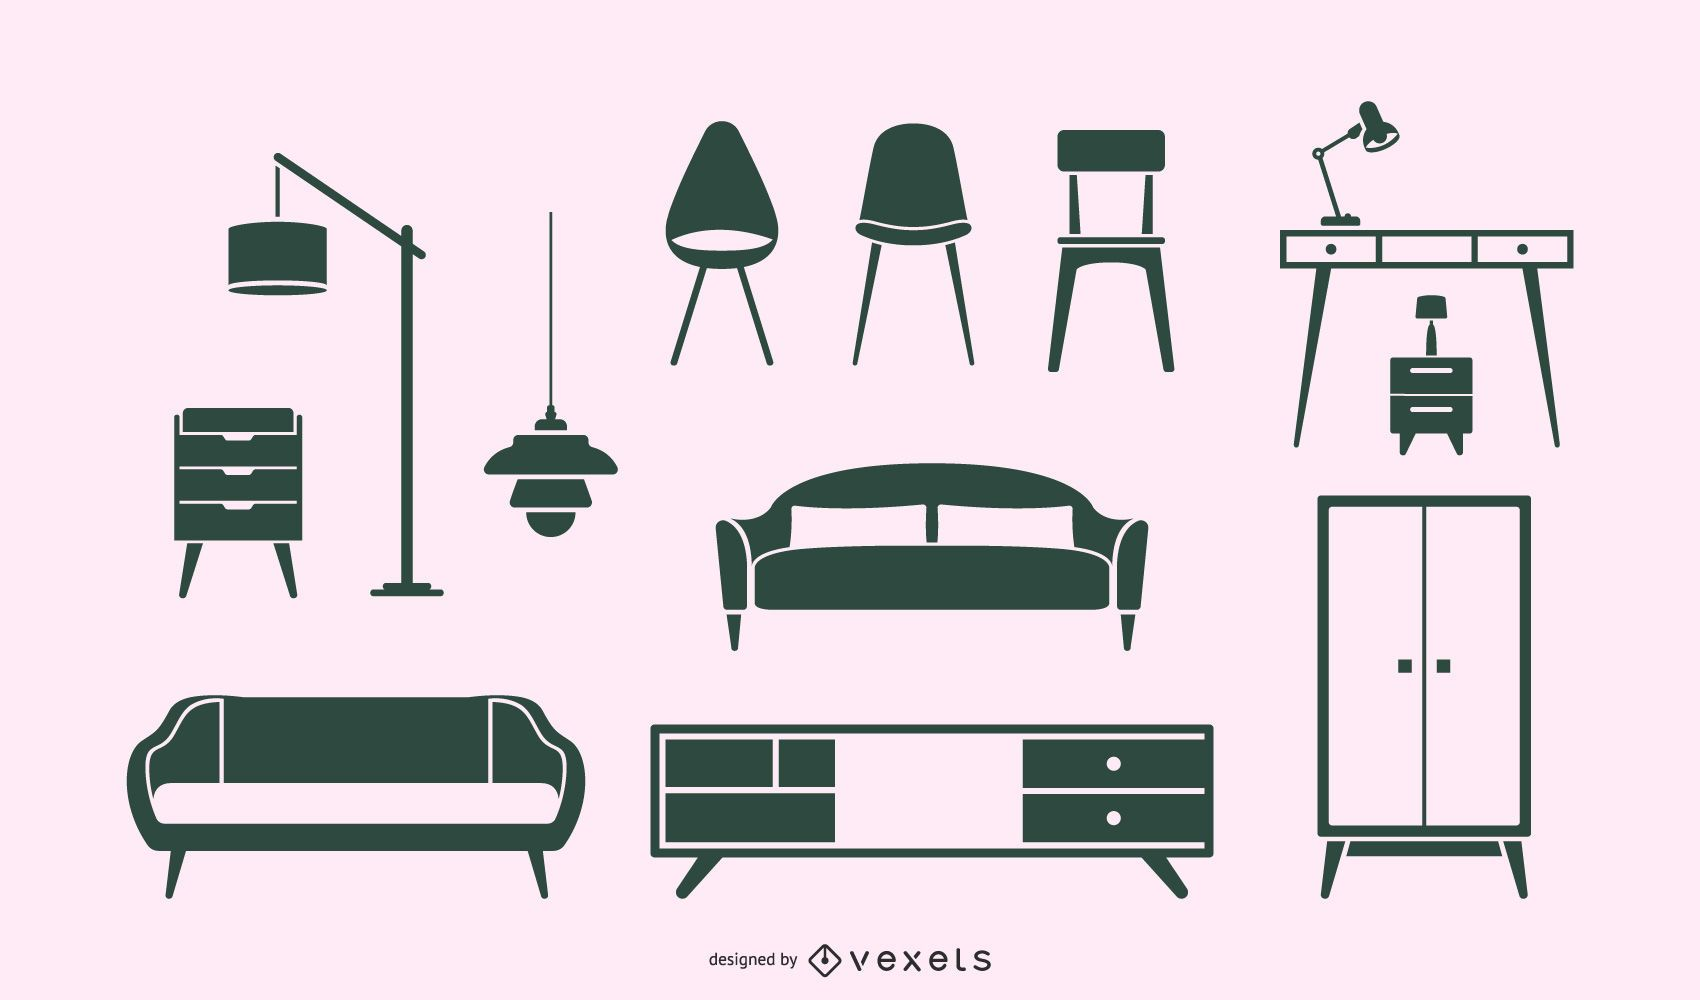 Paquete de diseño de silueta de muebles nórdicos